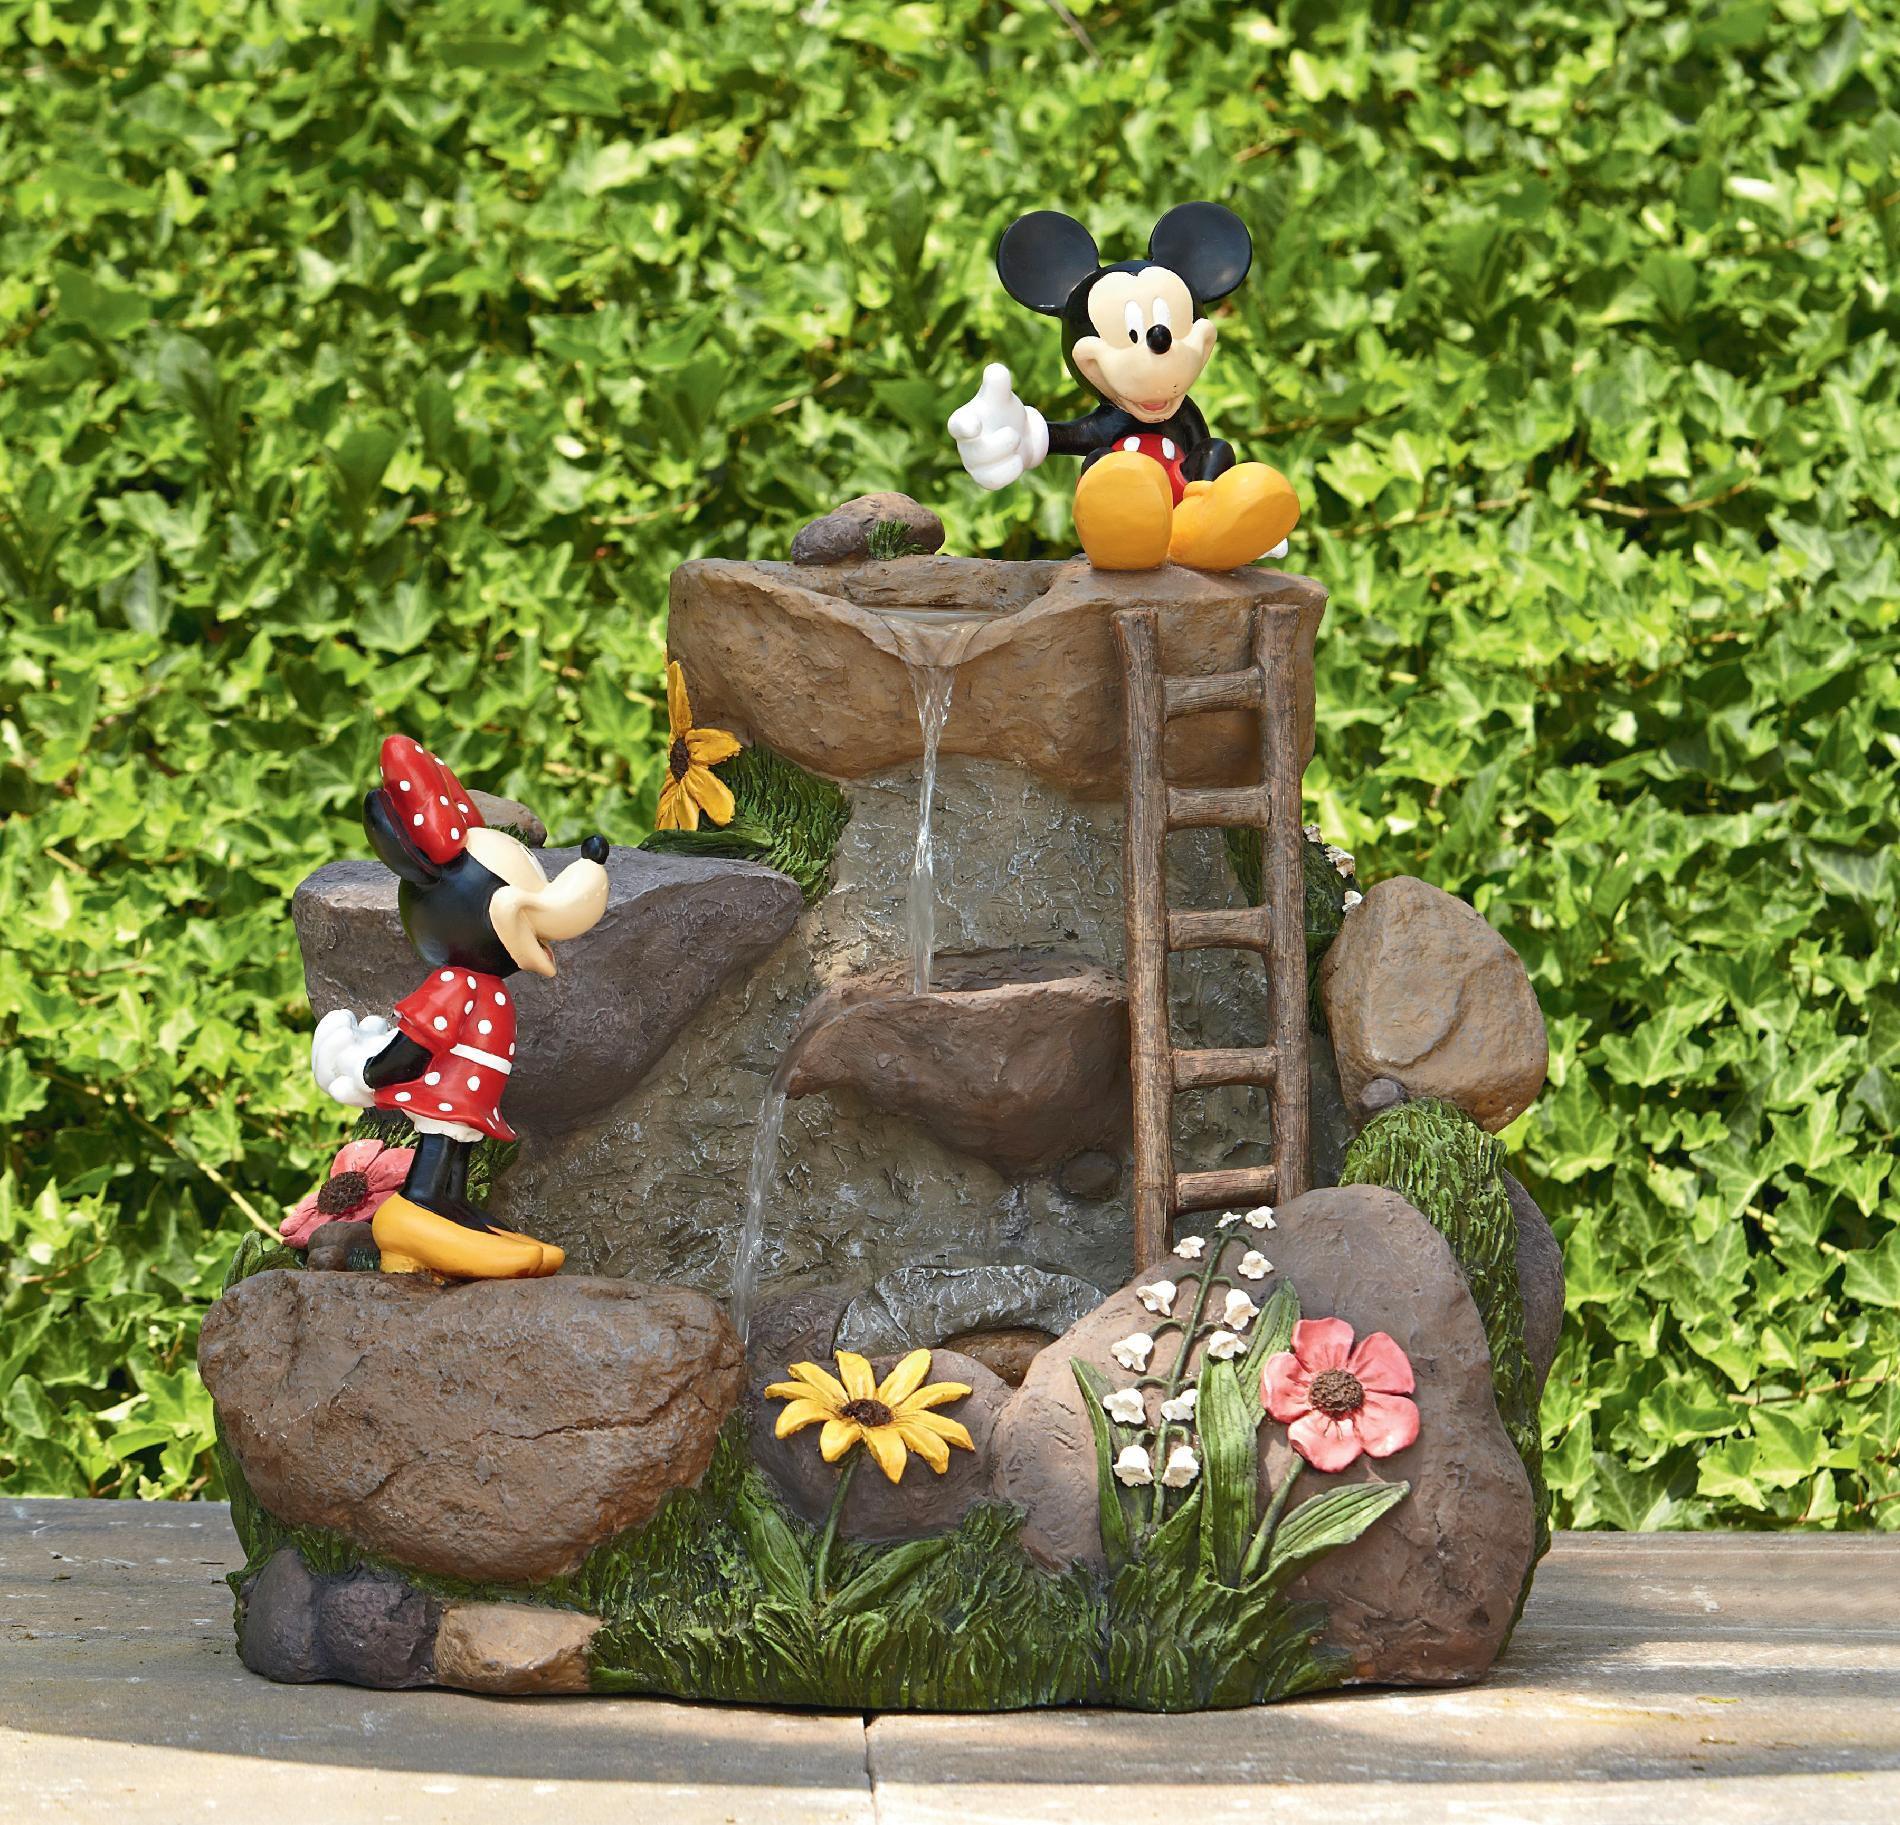 Disney Mouse Cascading Fountain Playful Outdoor Decor At